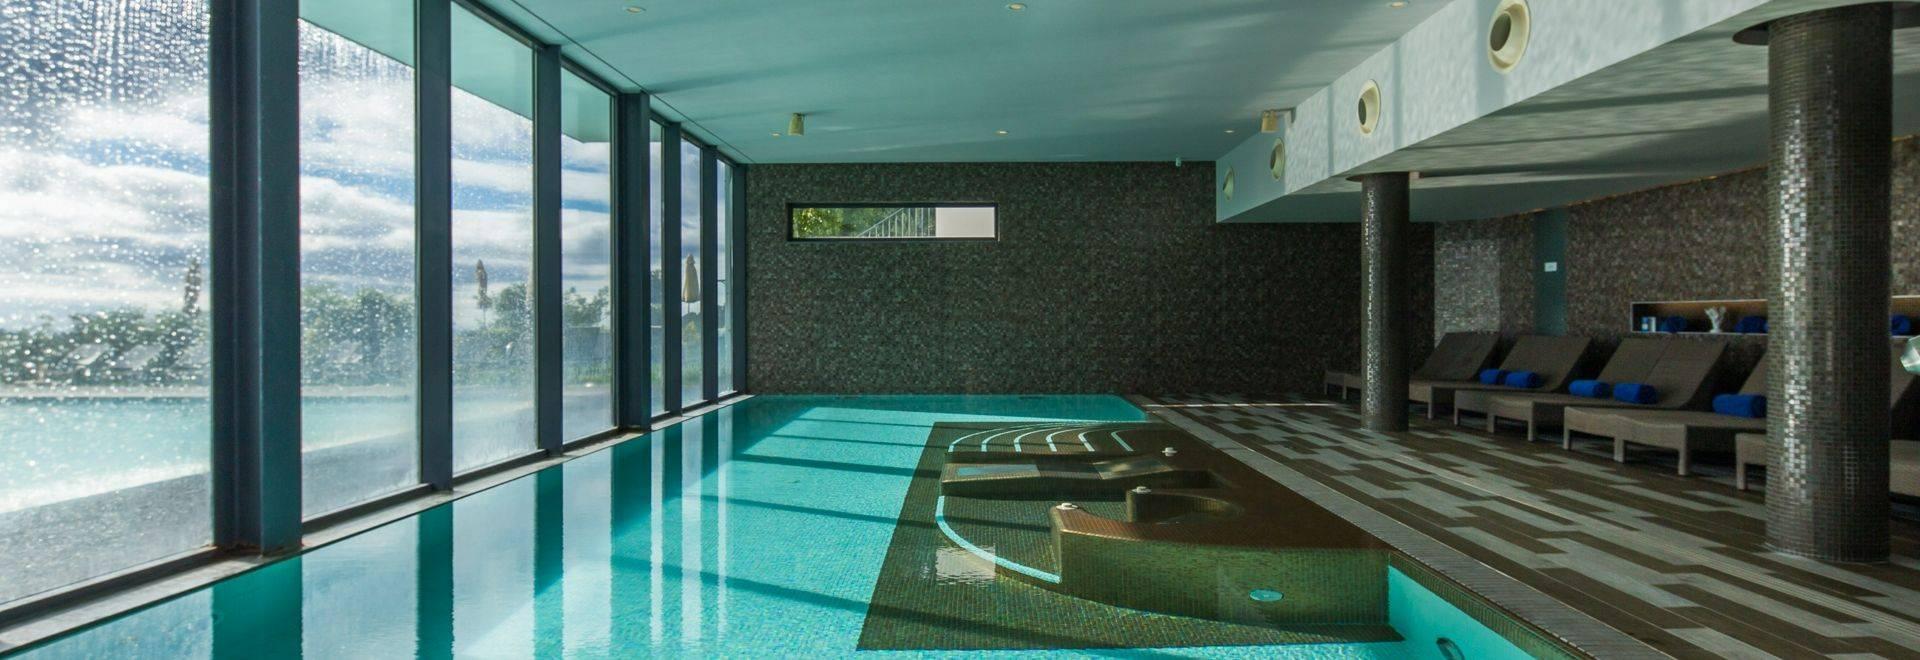 Macdonald Monchique Spa Pool